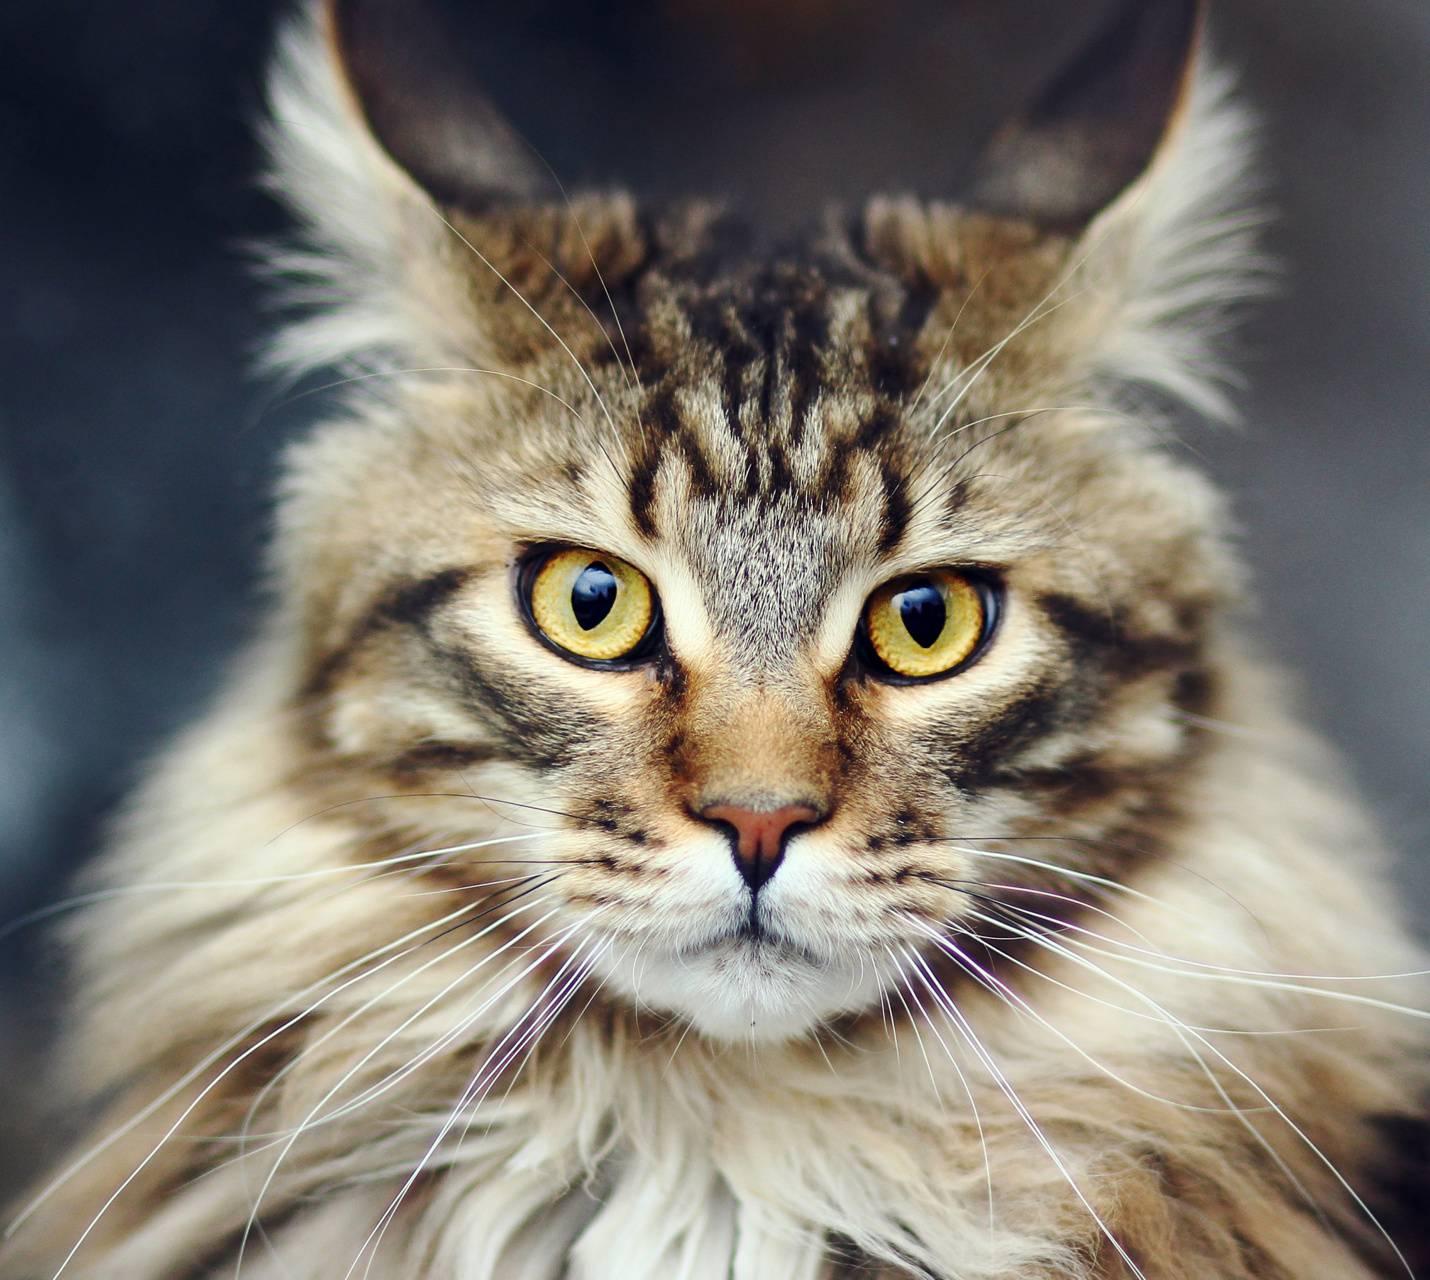 Furry Kitty